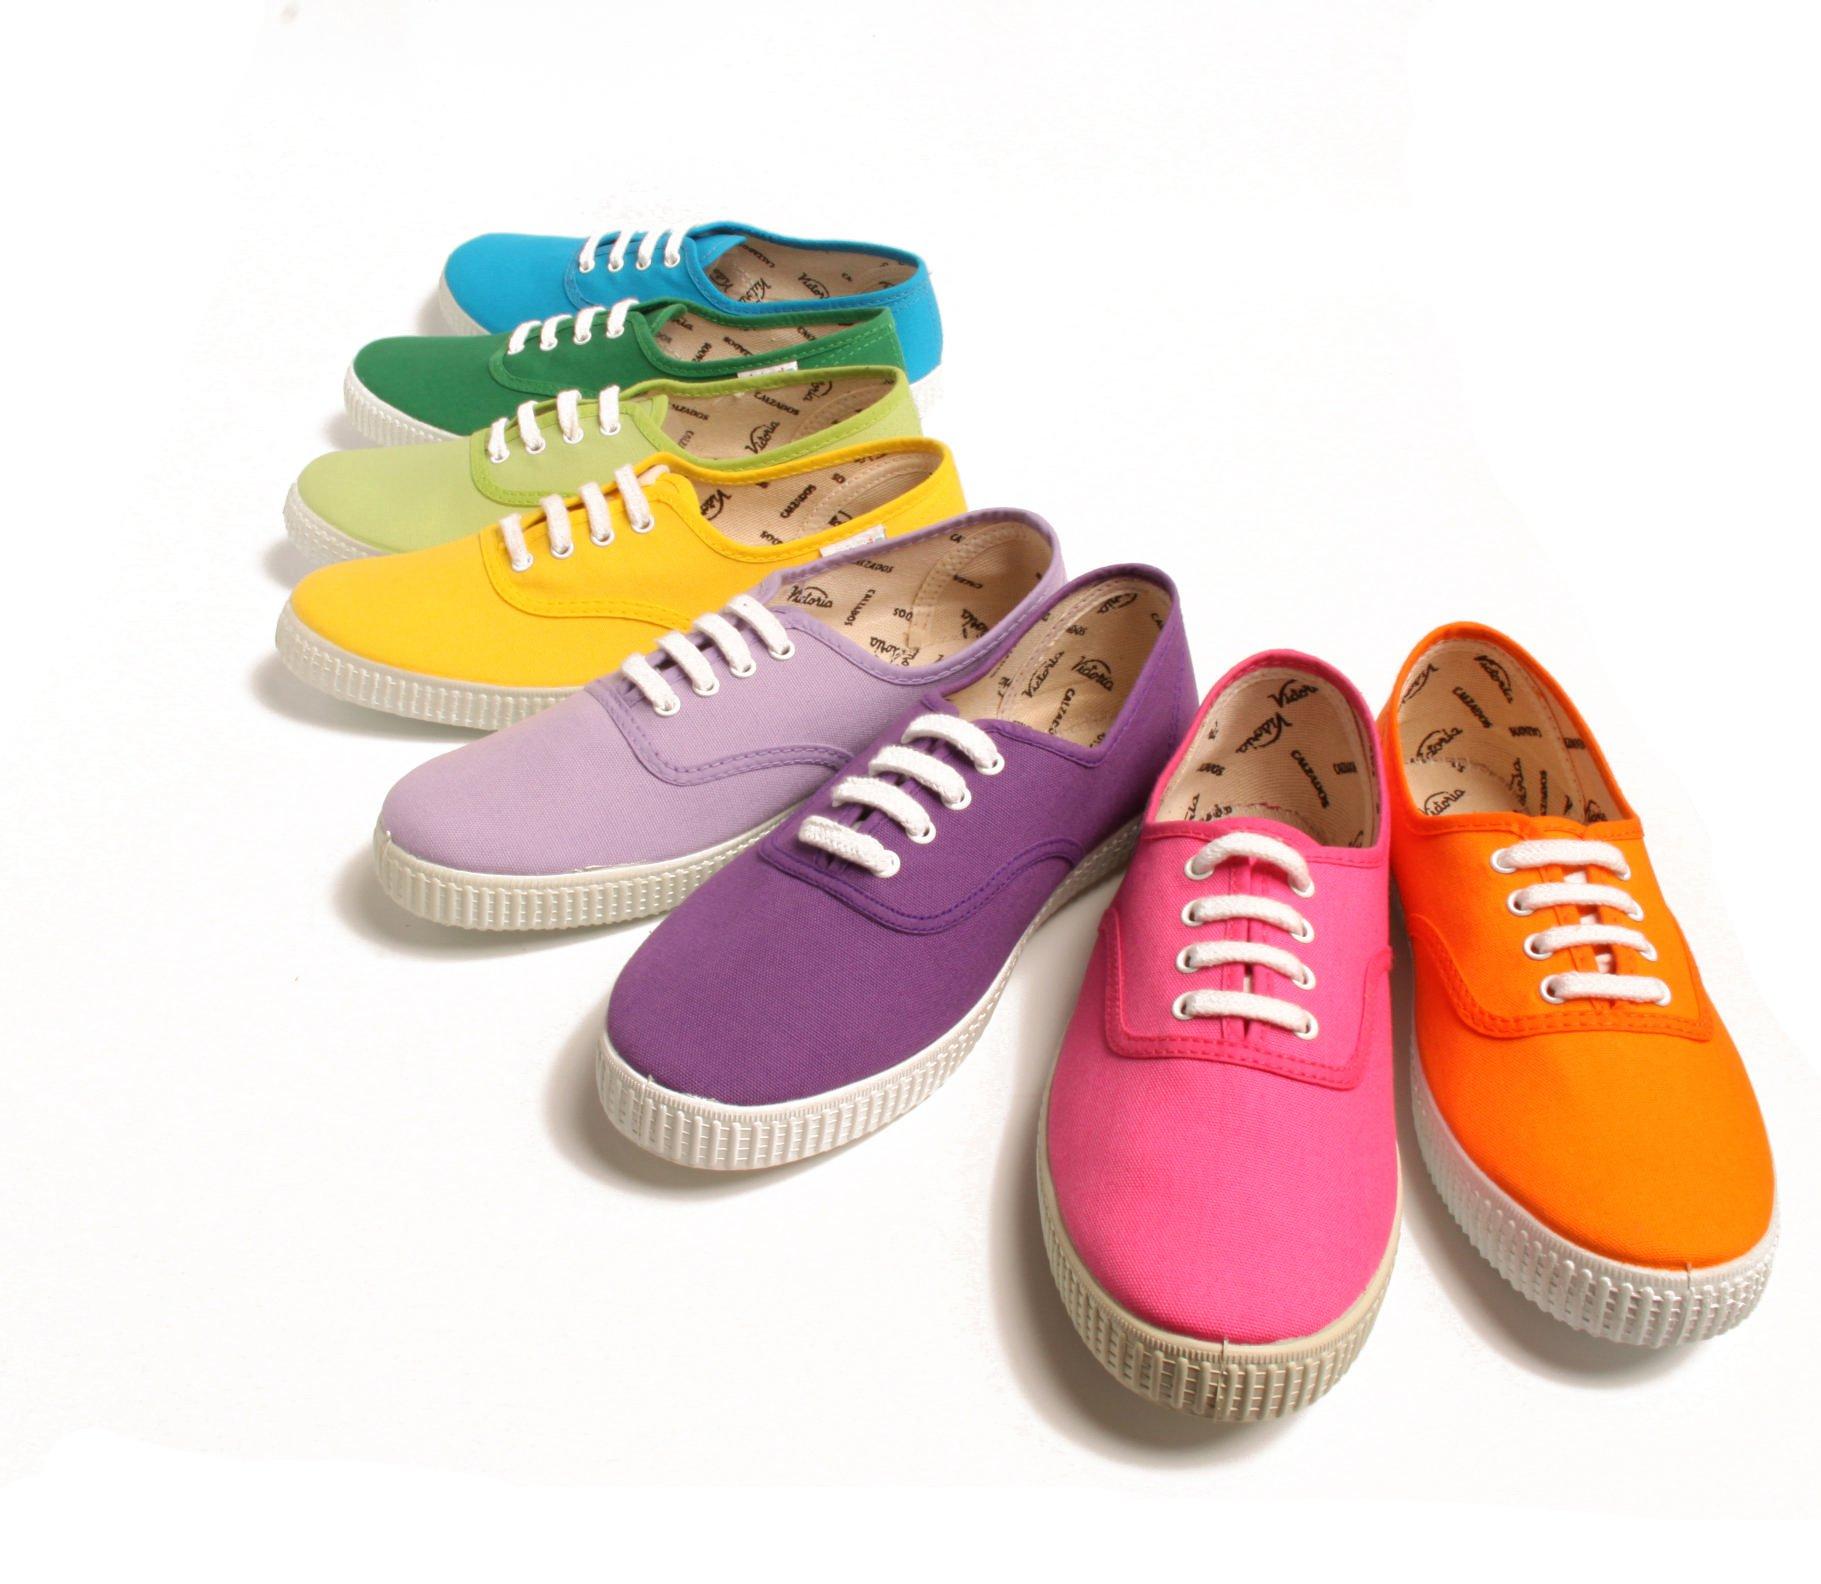 chaussures enfant victoria printemps t 2013 chaussures. Black Bedroom Furniture Sets. Home Design Ideas